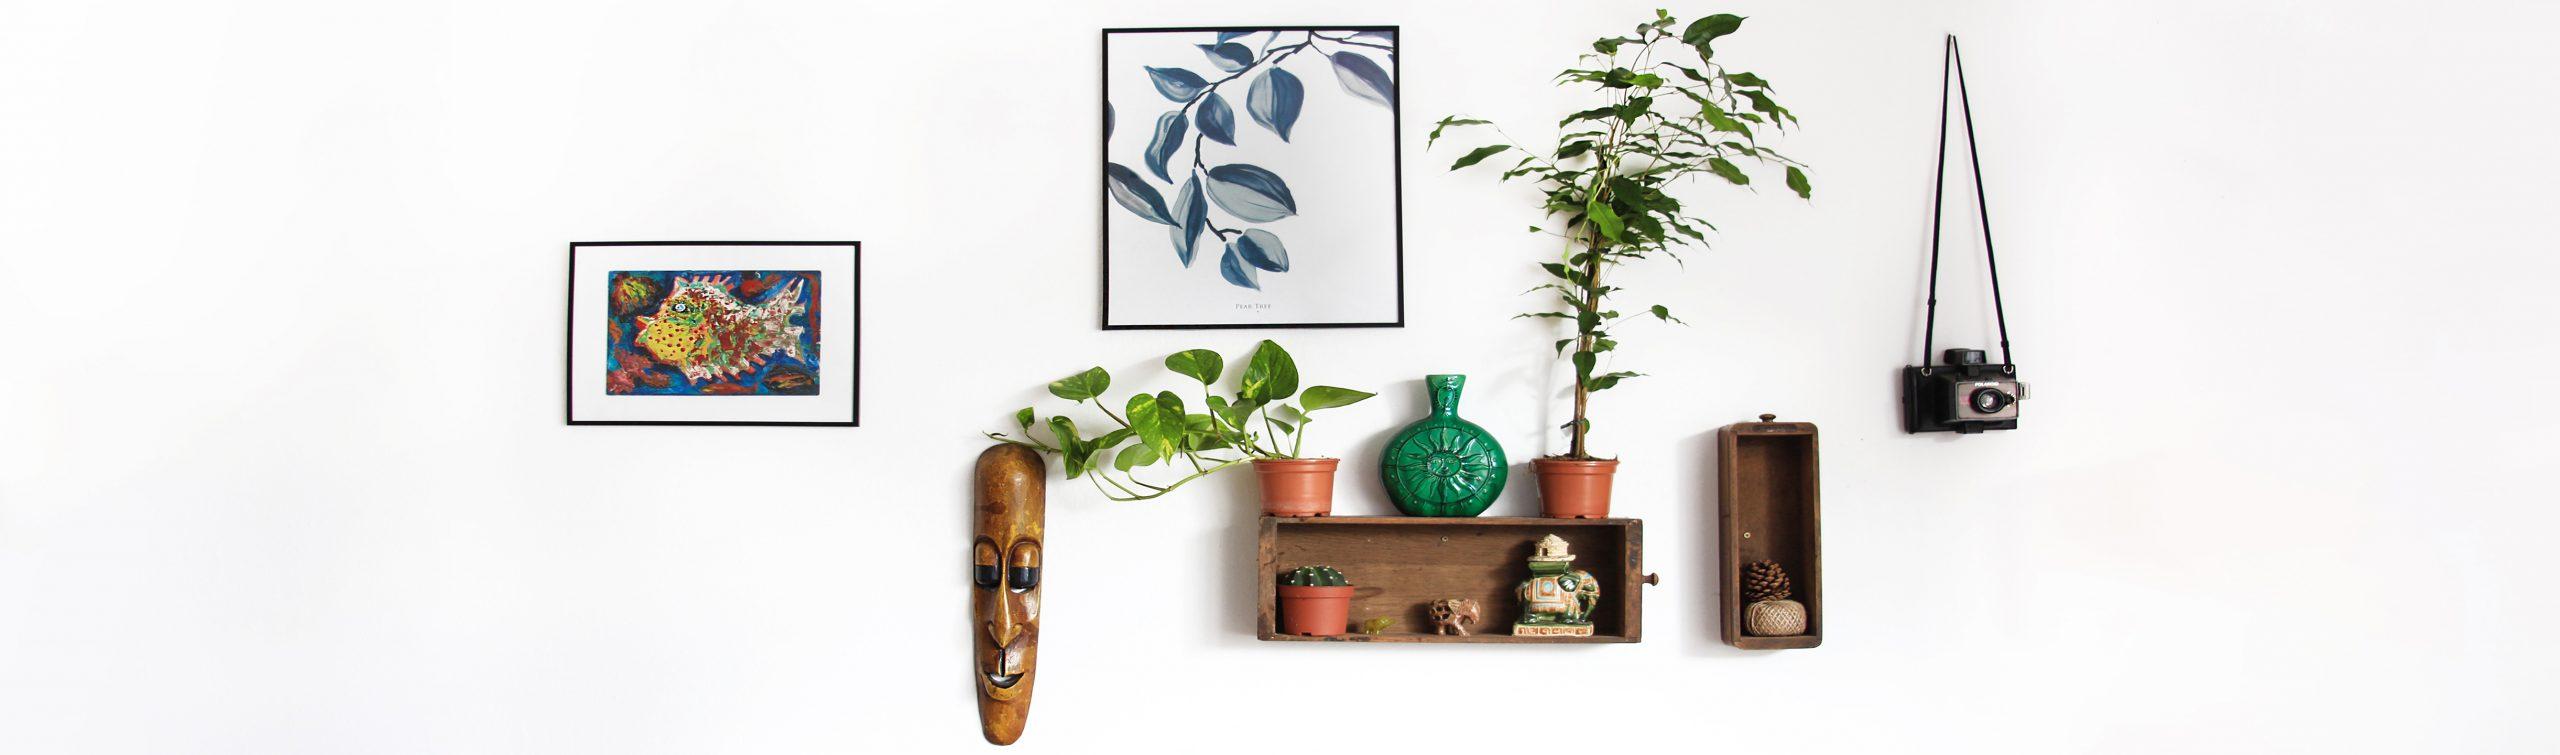 Wall Decorative Accessories